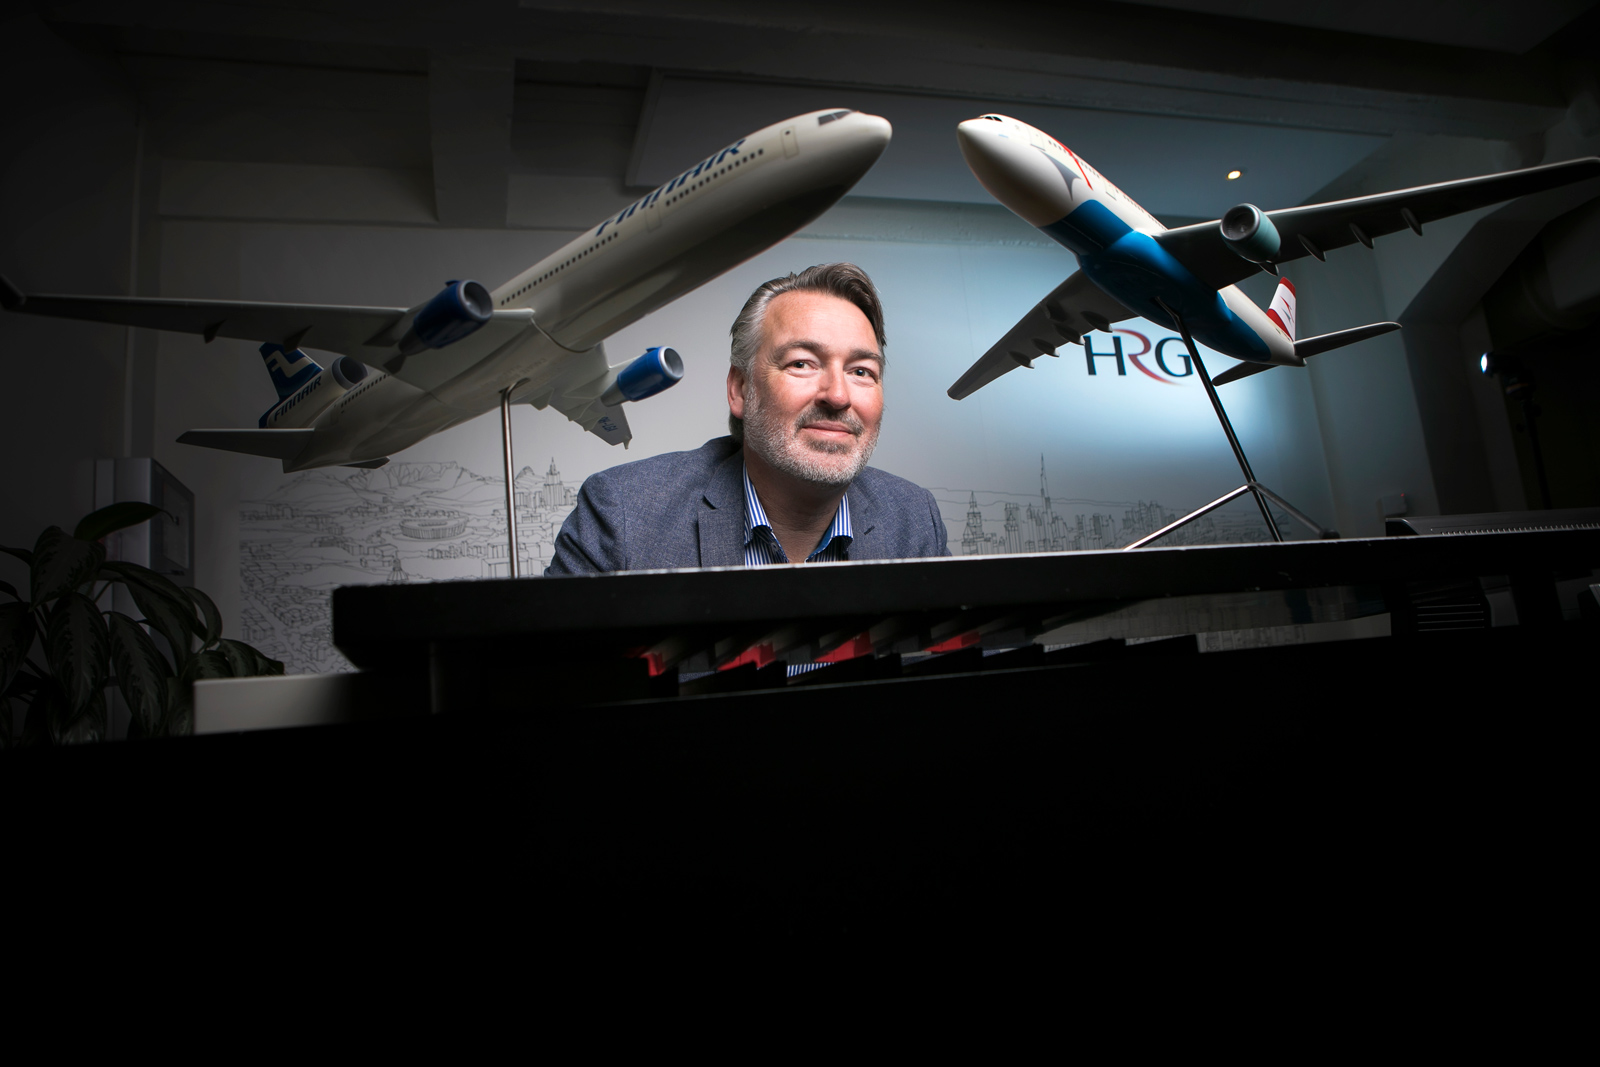 oachim Erenius, Managing Director of Business Travel Agency HRG